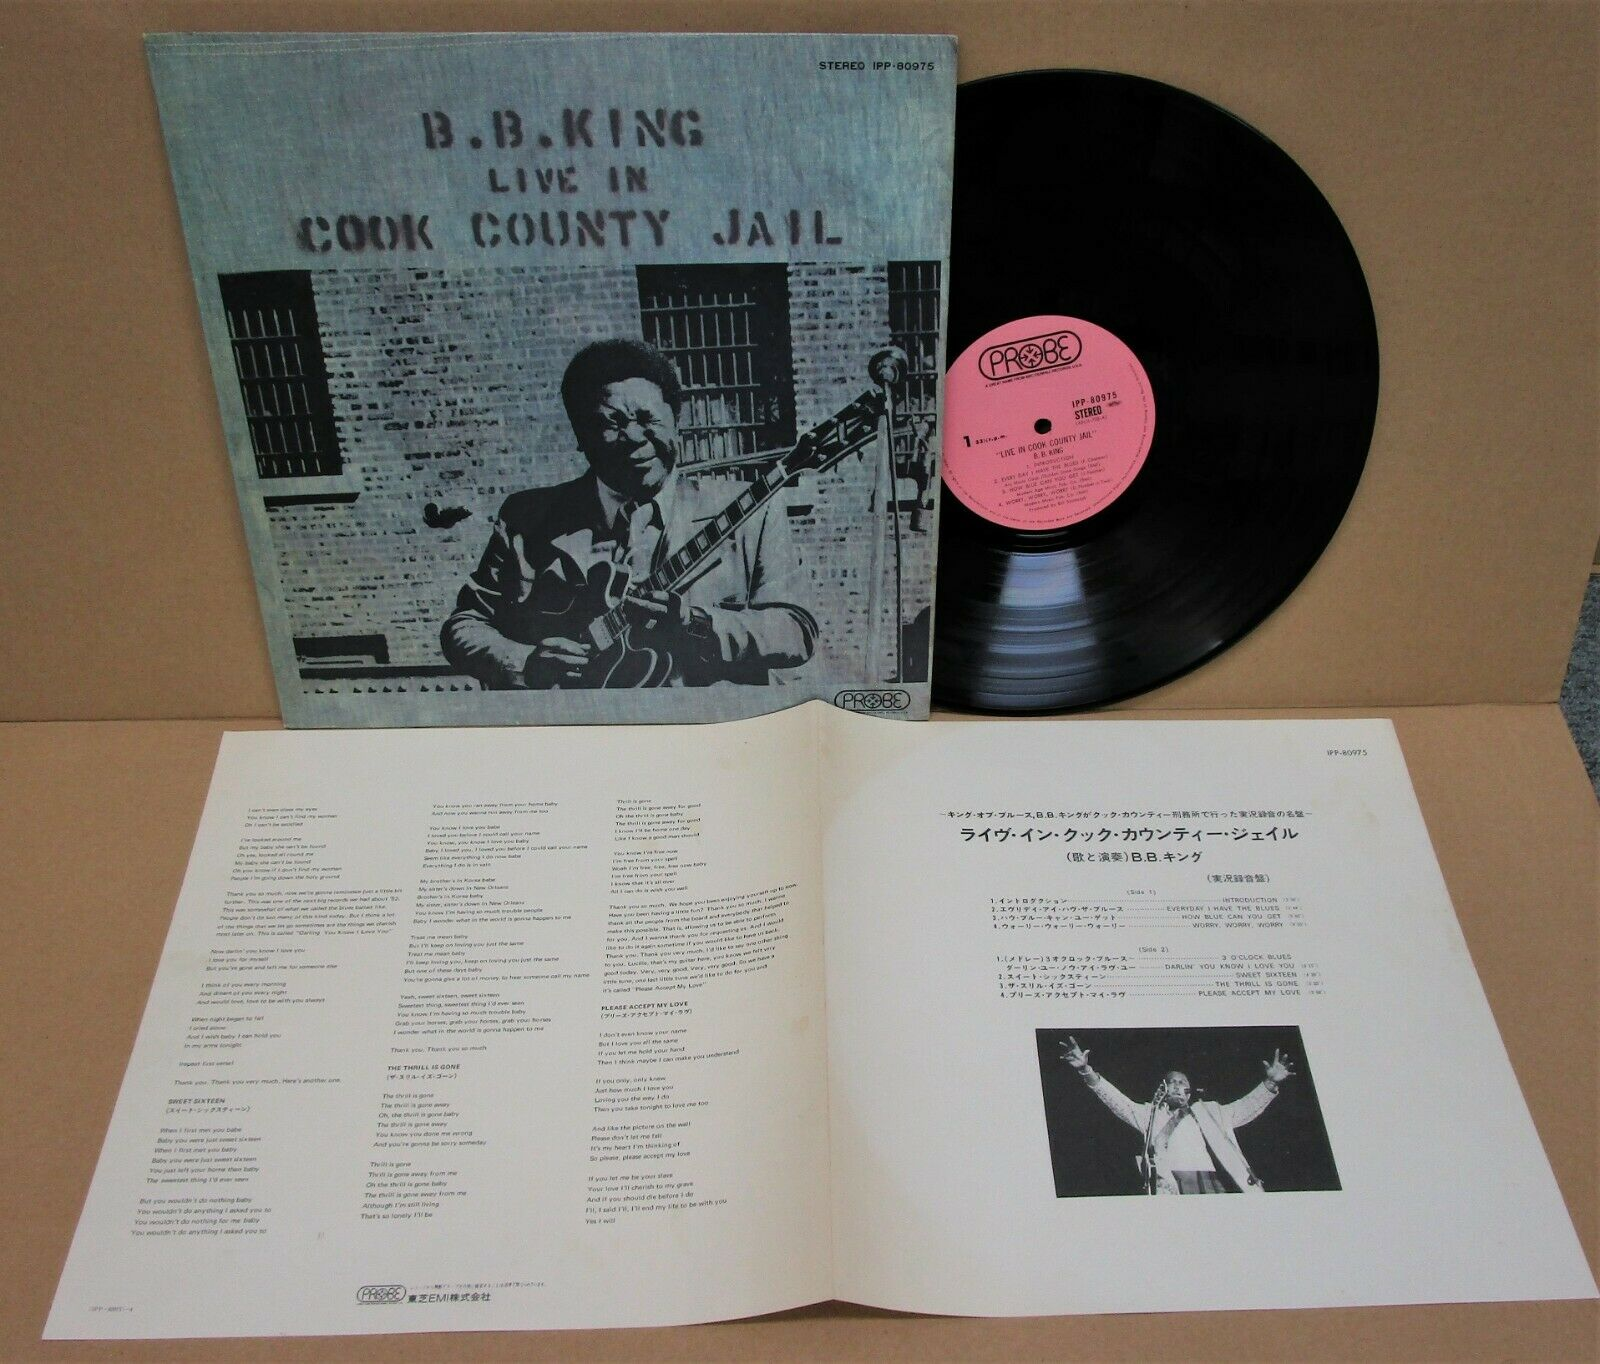 Live in Cook County jail disco de bb king gravado na prisão